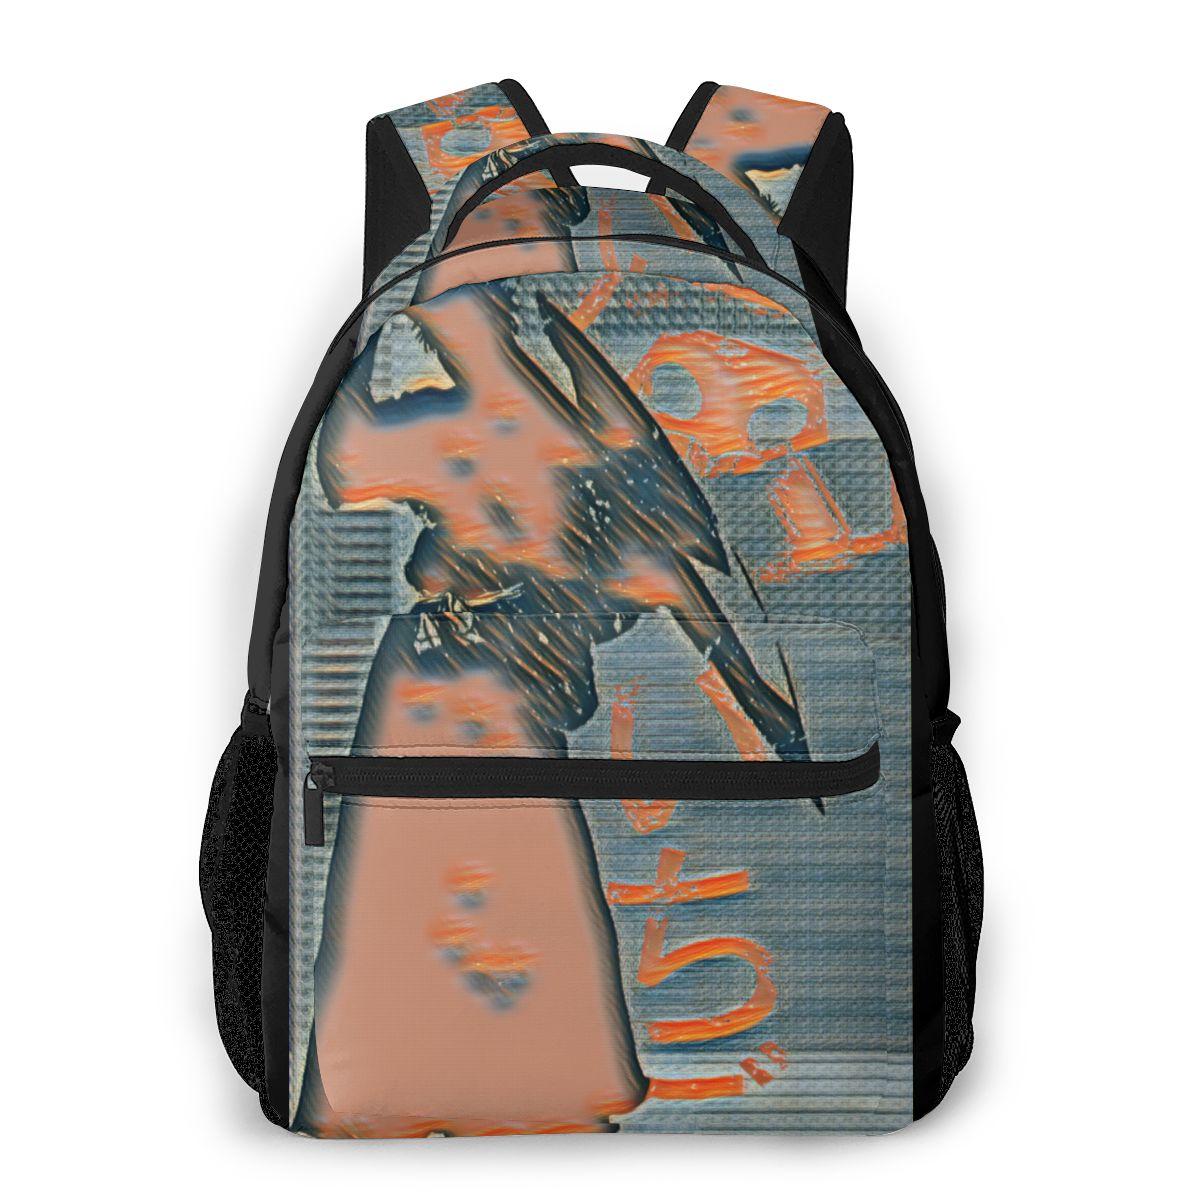 Kurosaki Ichigo, nuevo diseño, mochila BLEACH para adolescentes, mochila de libros